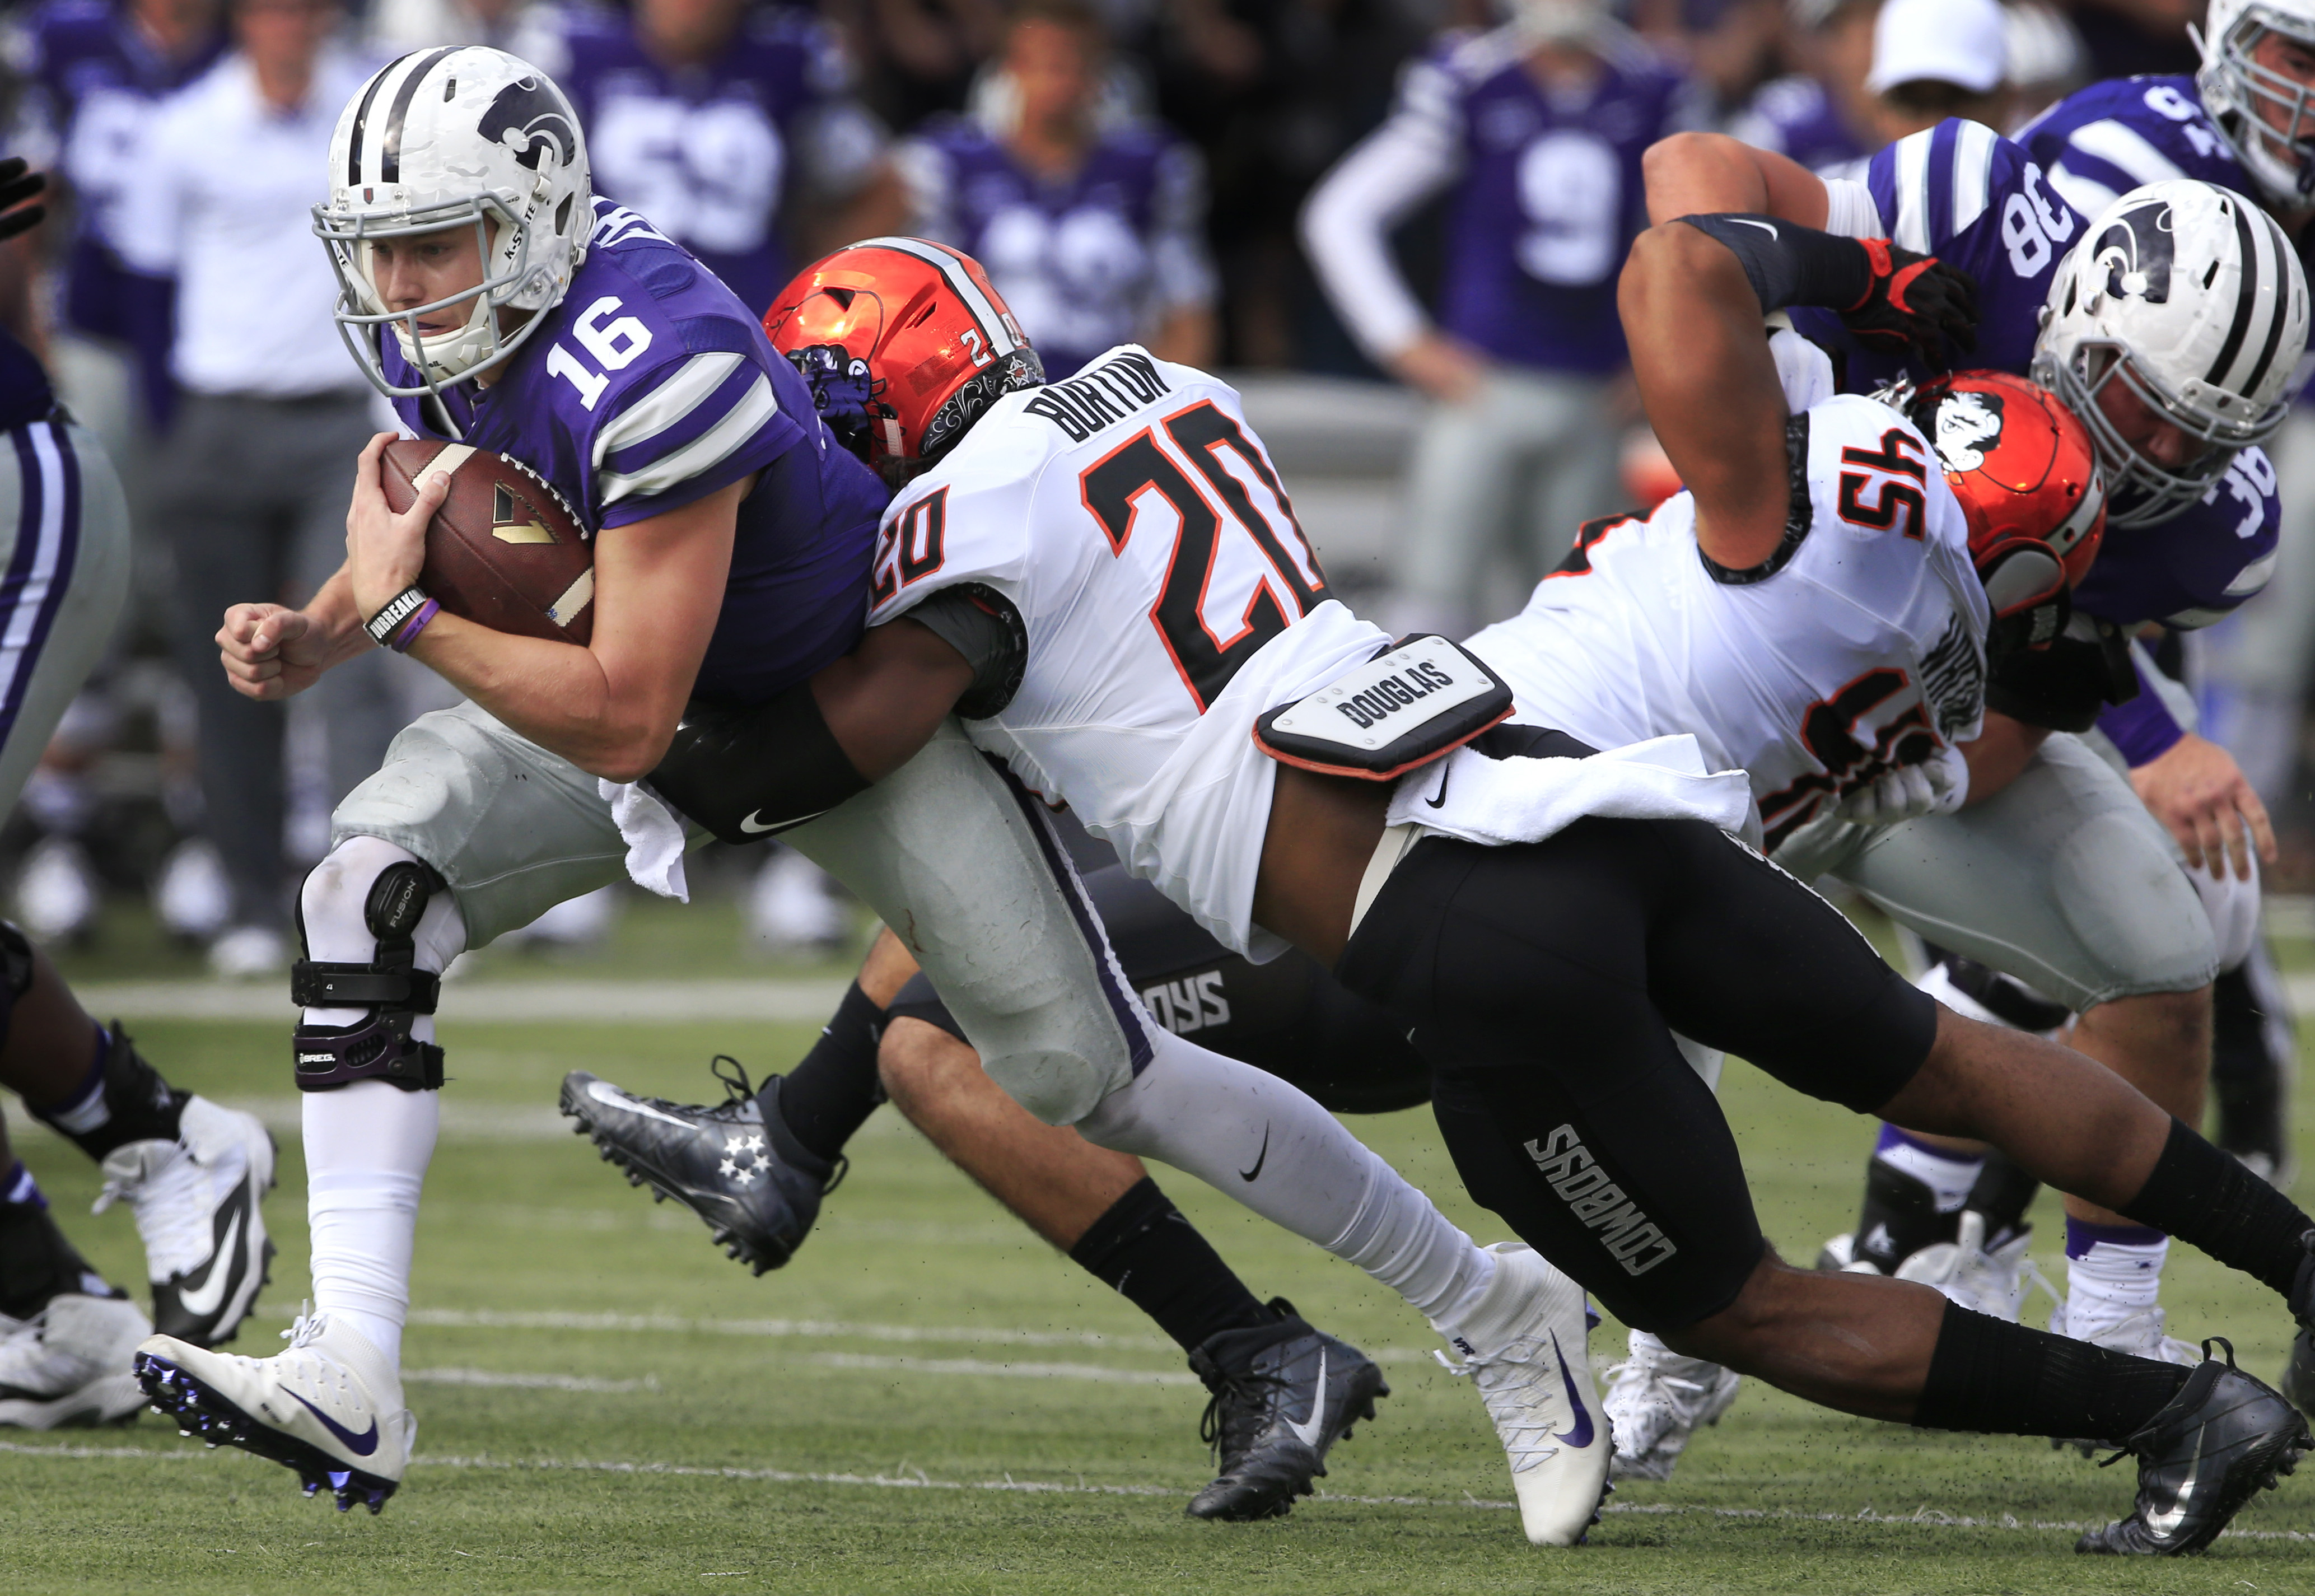 Kansas State quarterback Jesse Ertz (16) is tackled by Oklahoma State linebacker Jordan Burton (20) during the first half of an NCAA college football game in Manhattan, Kan., Saturday, Nov. 5, 2016. (AP Photo/Orlin Wagner)